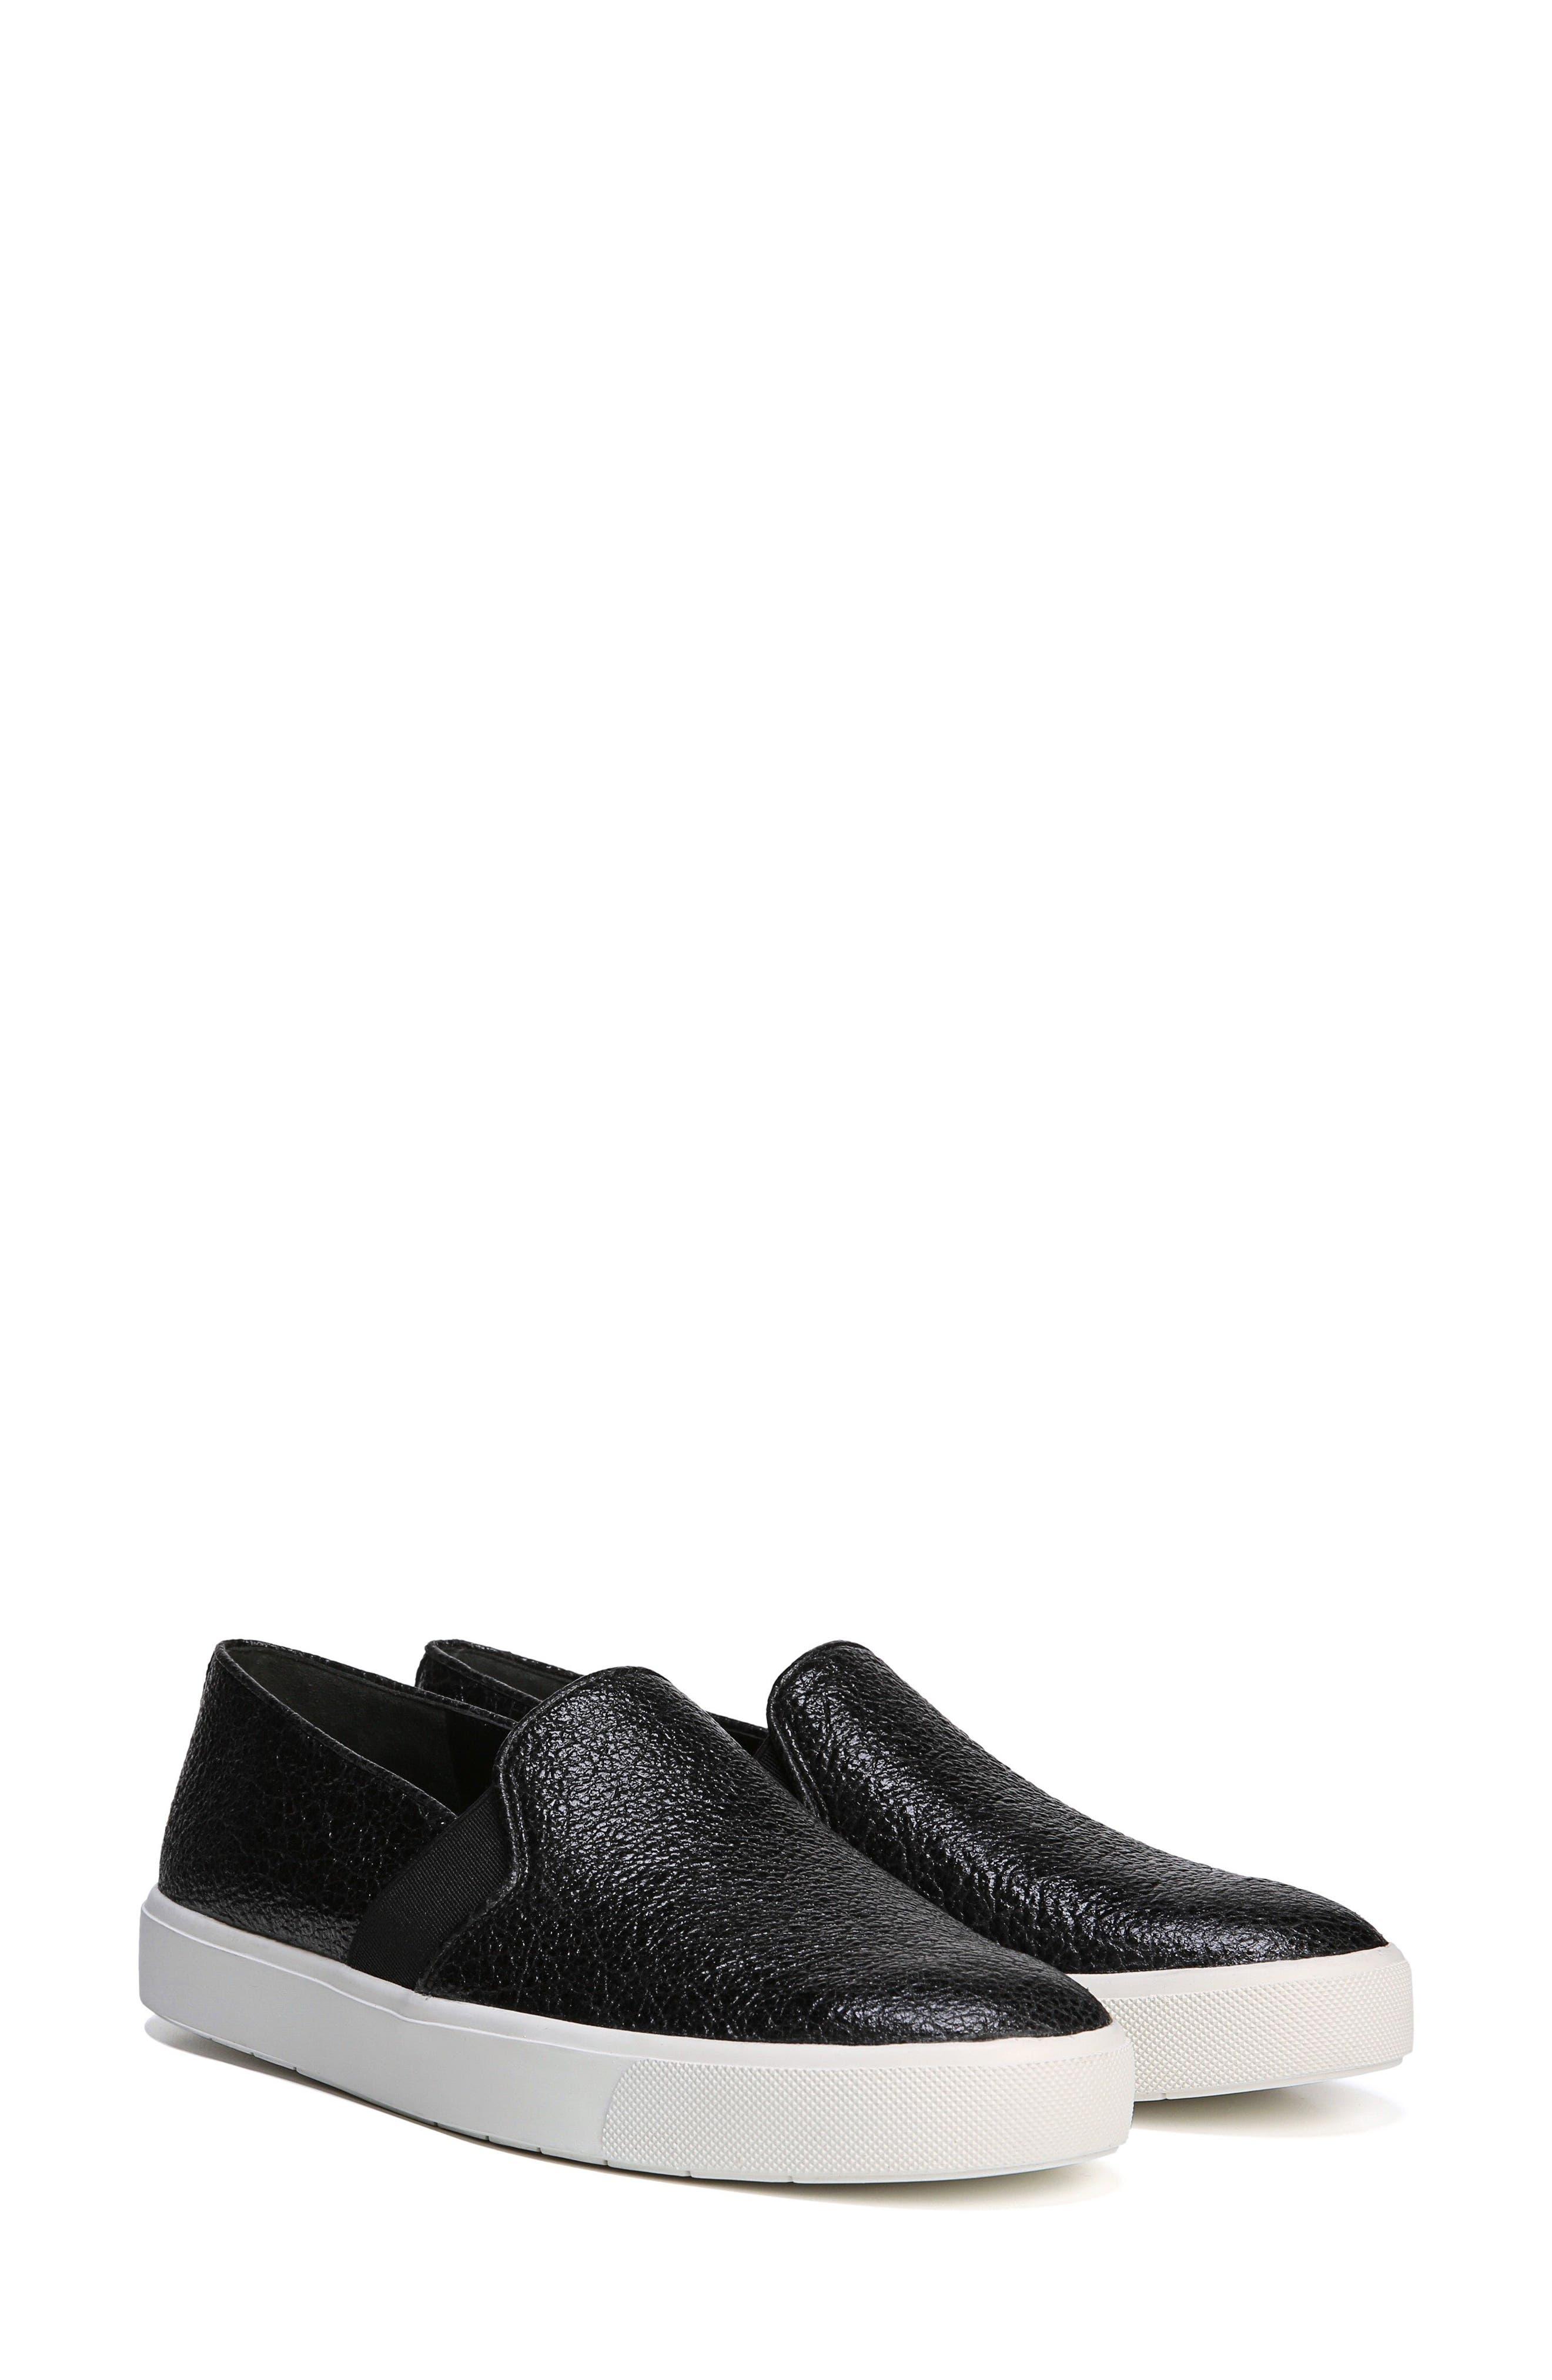 'Blair 12' Leather Slip-On Sneaker,                             Alternate thumbnail 7, color,                             BLACK LEATHER